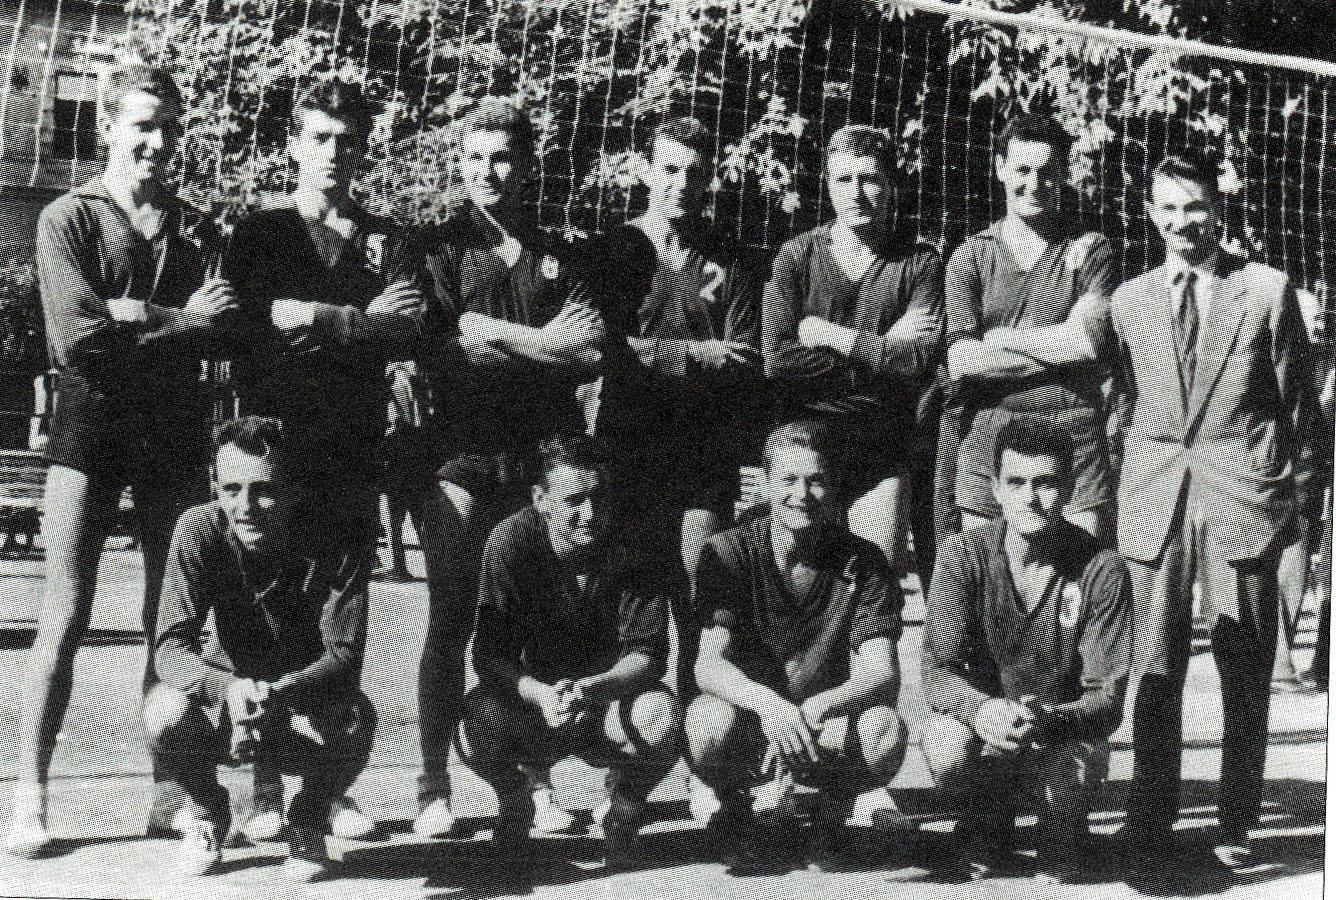 https://www.vkpbratislava.sk/wp-content/uploads/2020/10/volejbal-narodne-druzstvo-1950.jpg